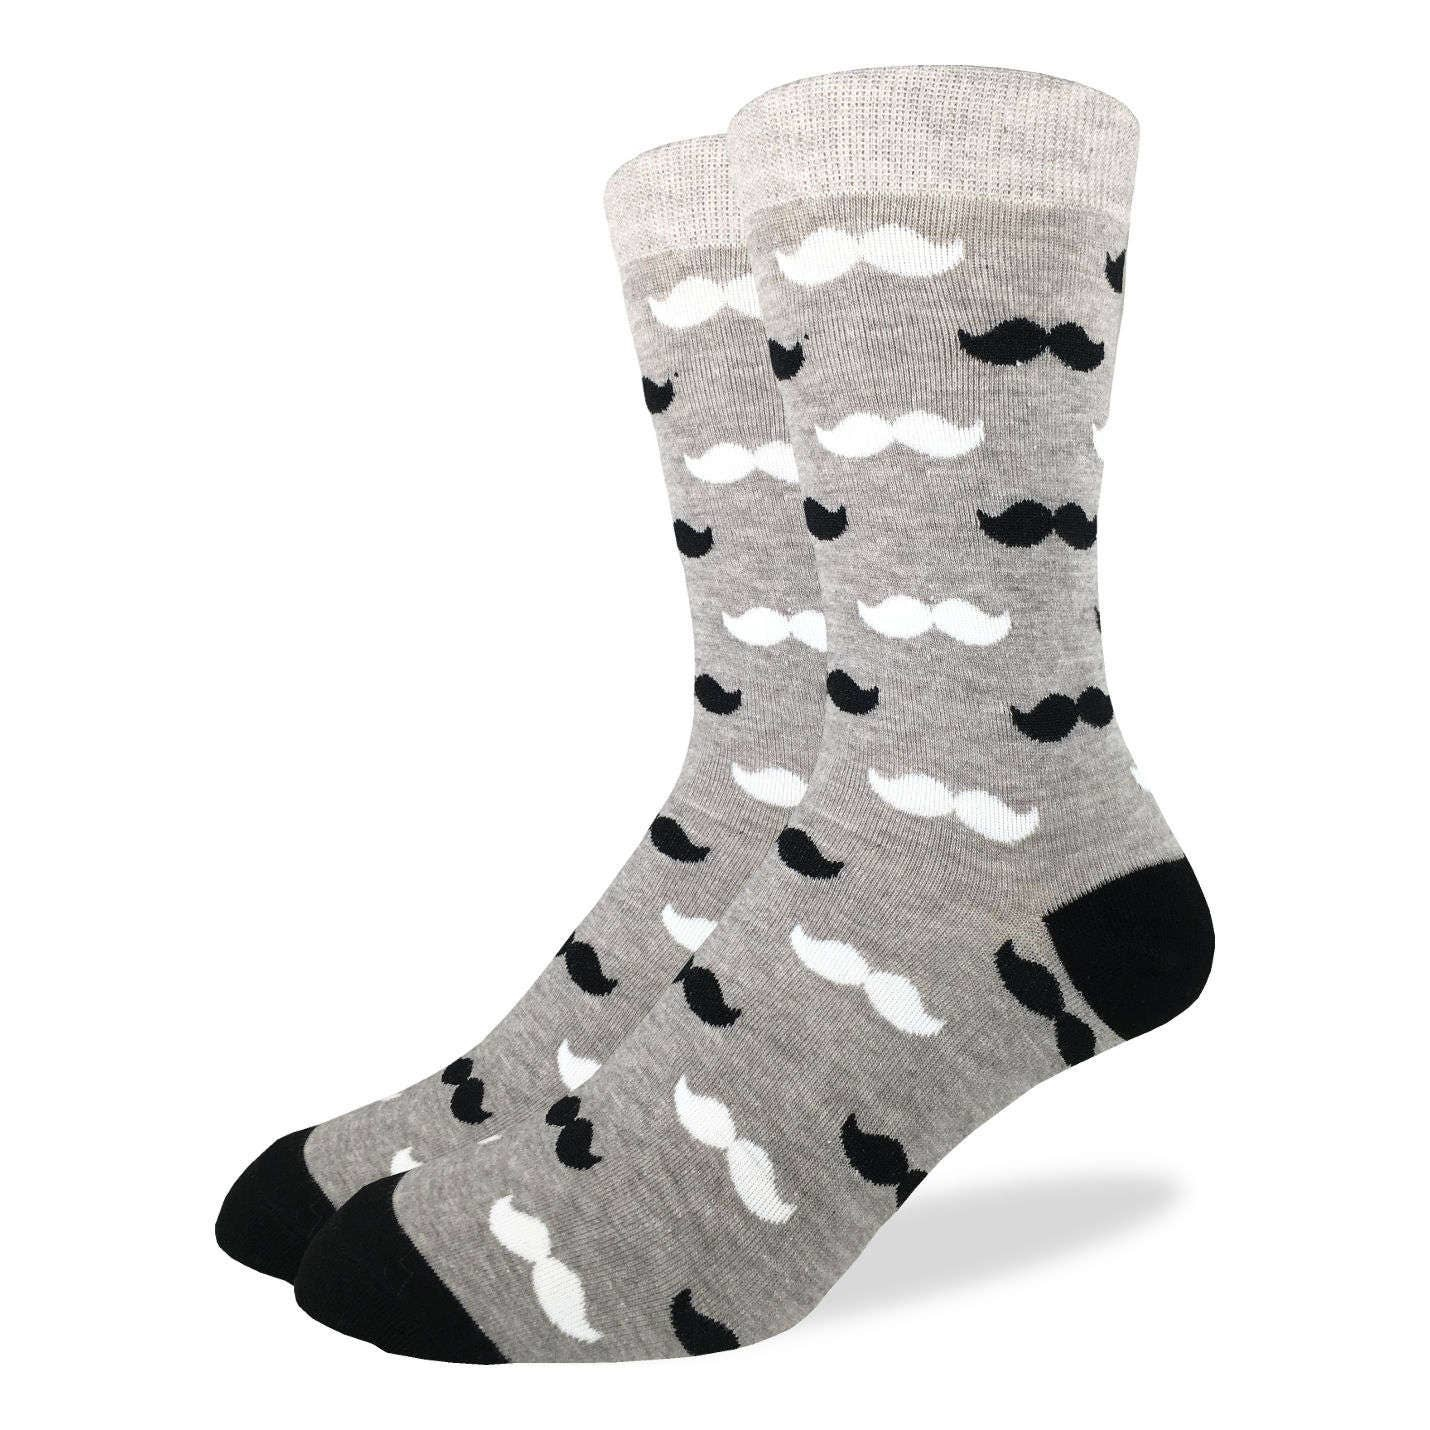 Black & Gray Mustache Men's Crew Socks